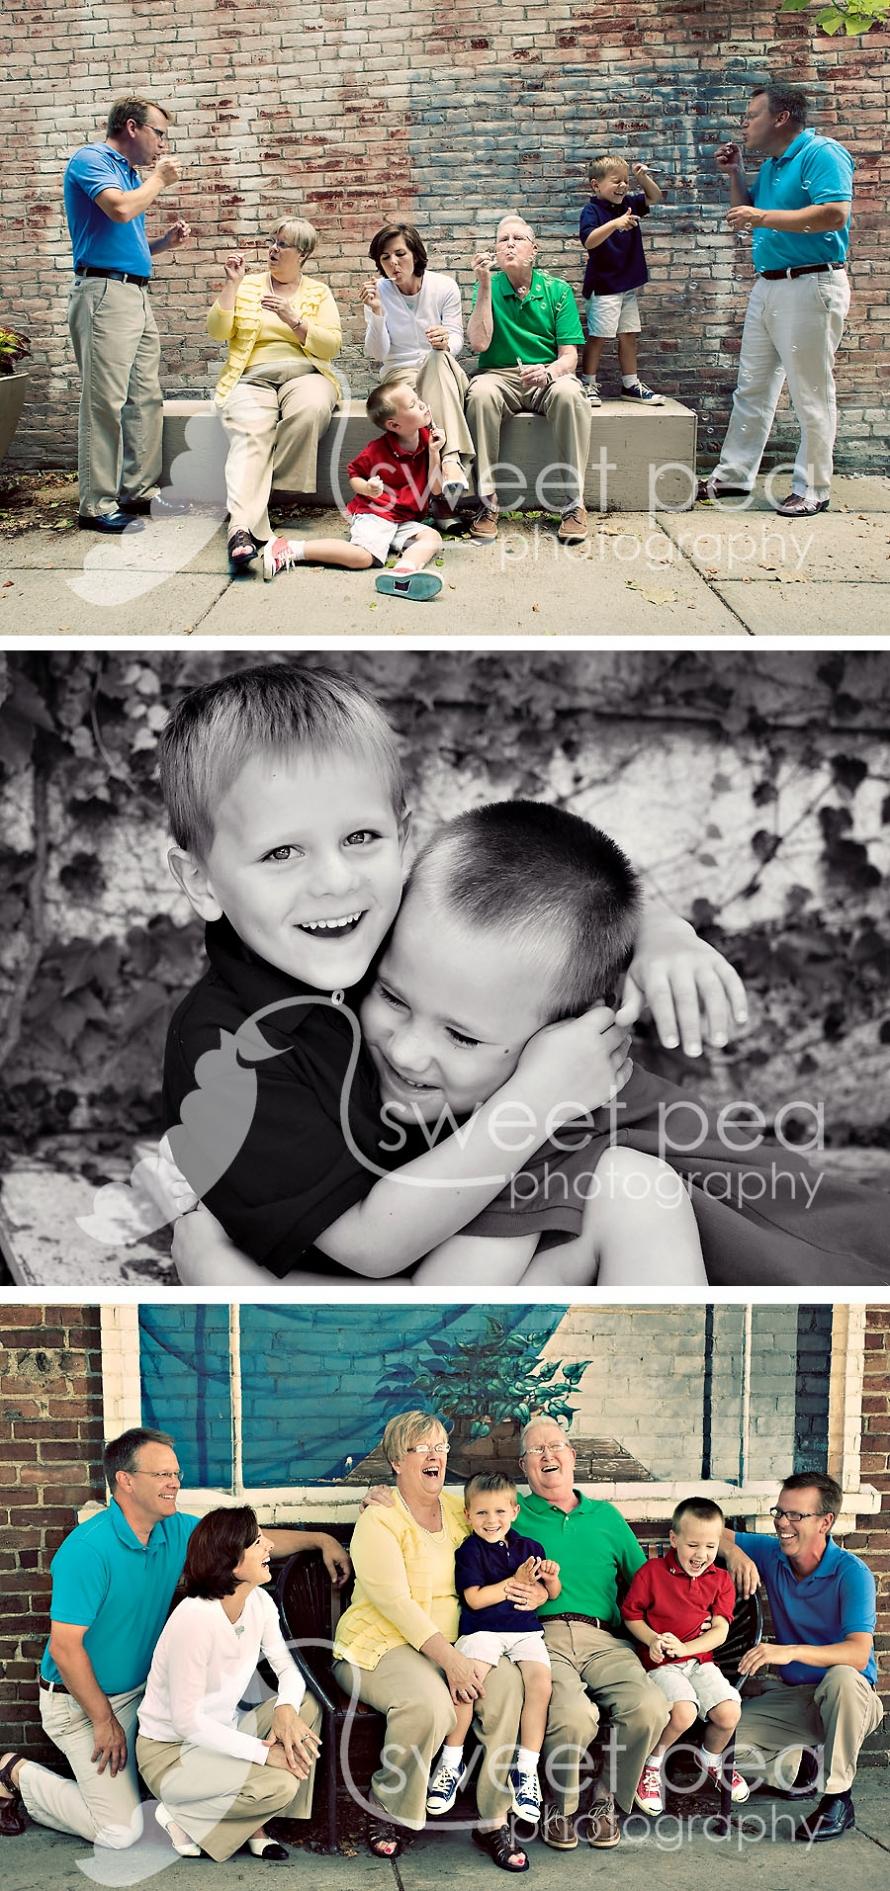 urbana_family_photographer072110